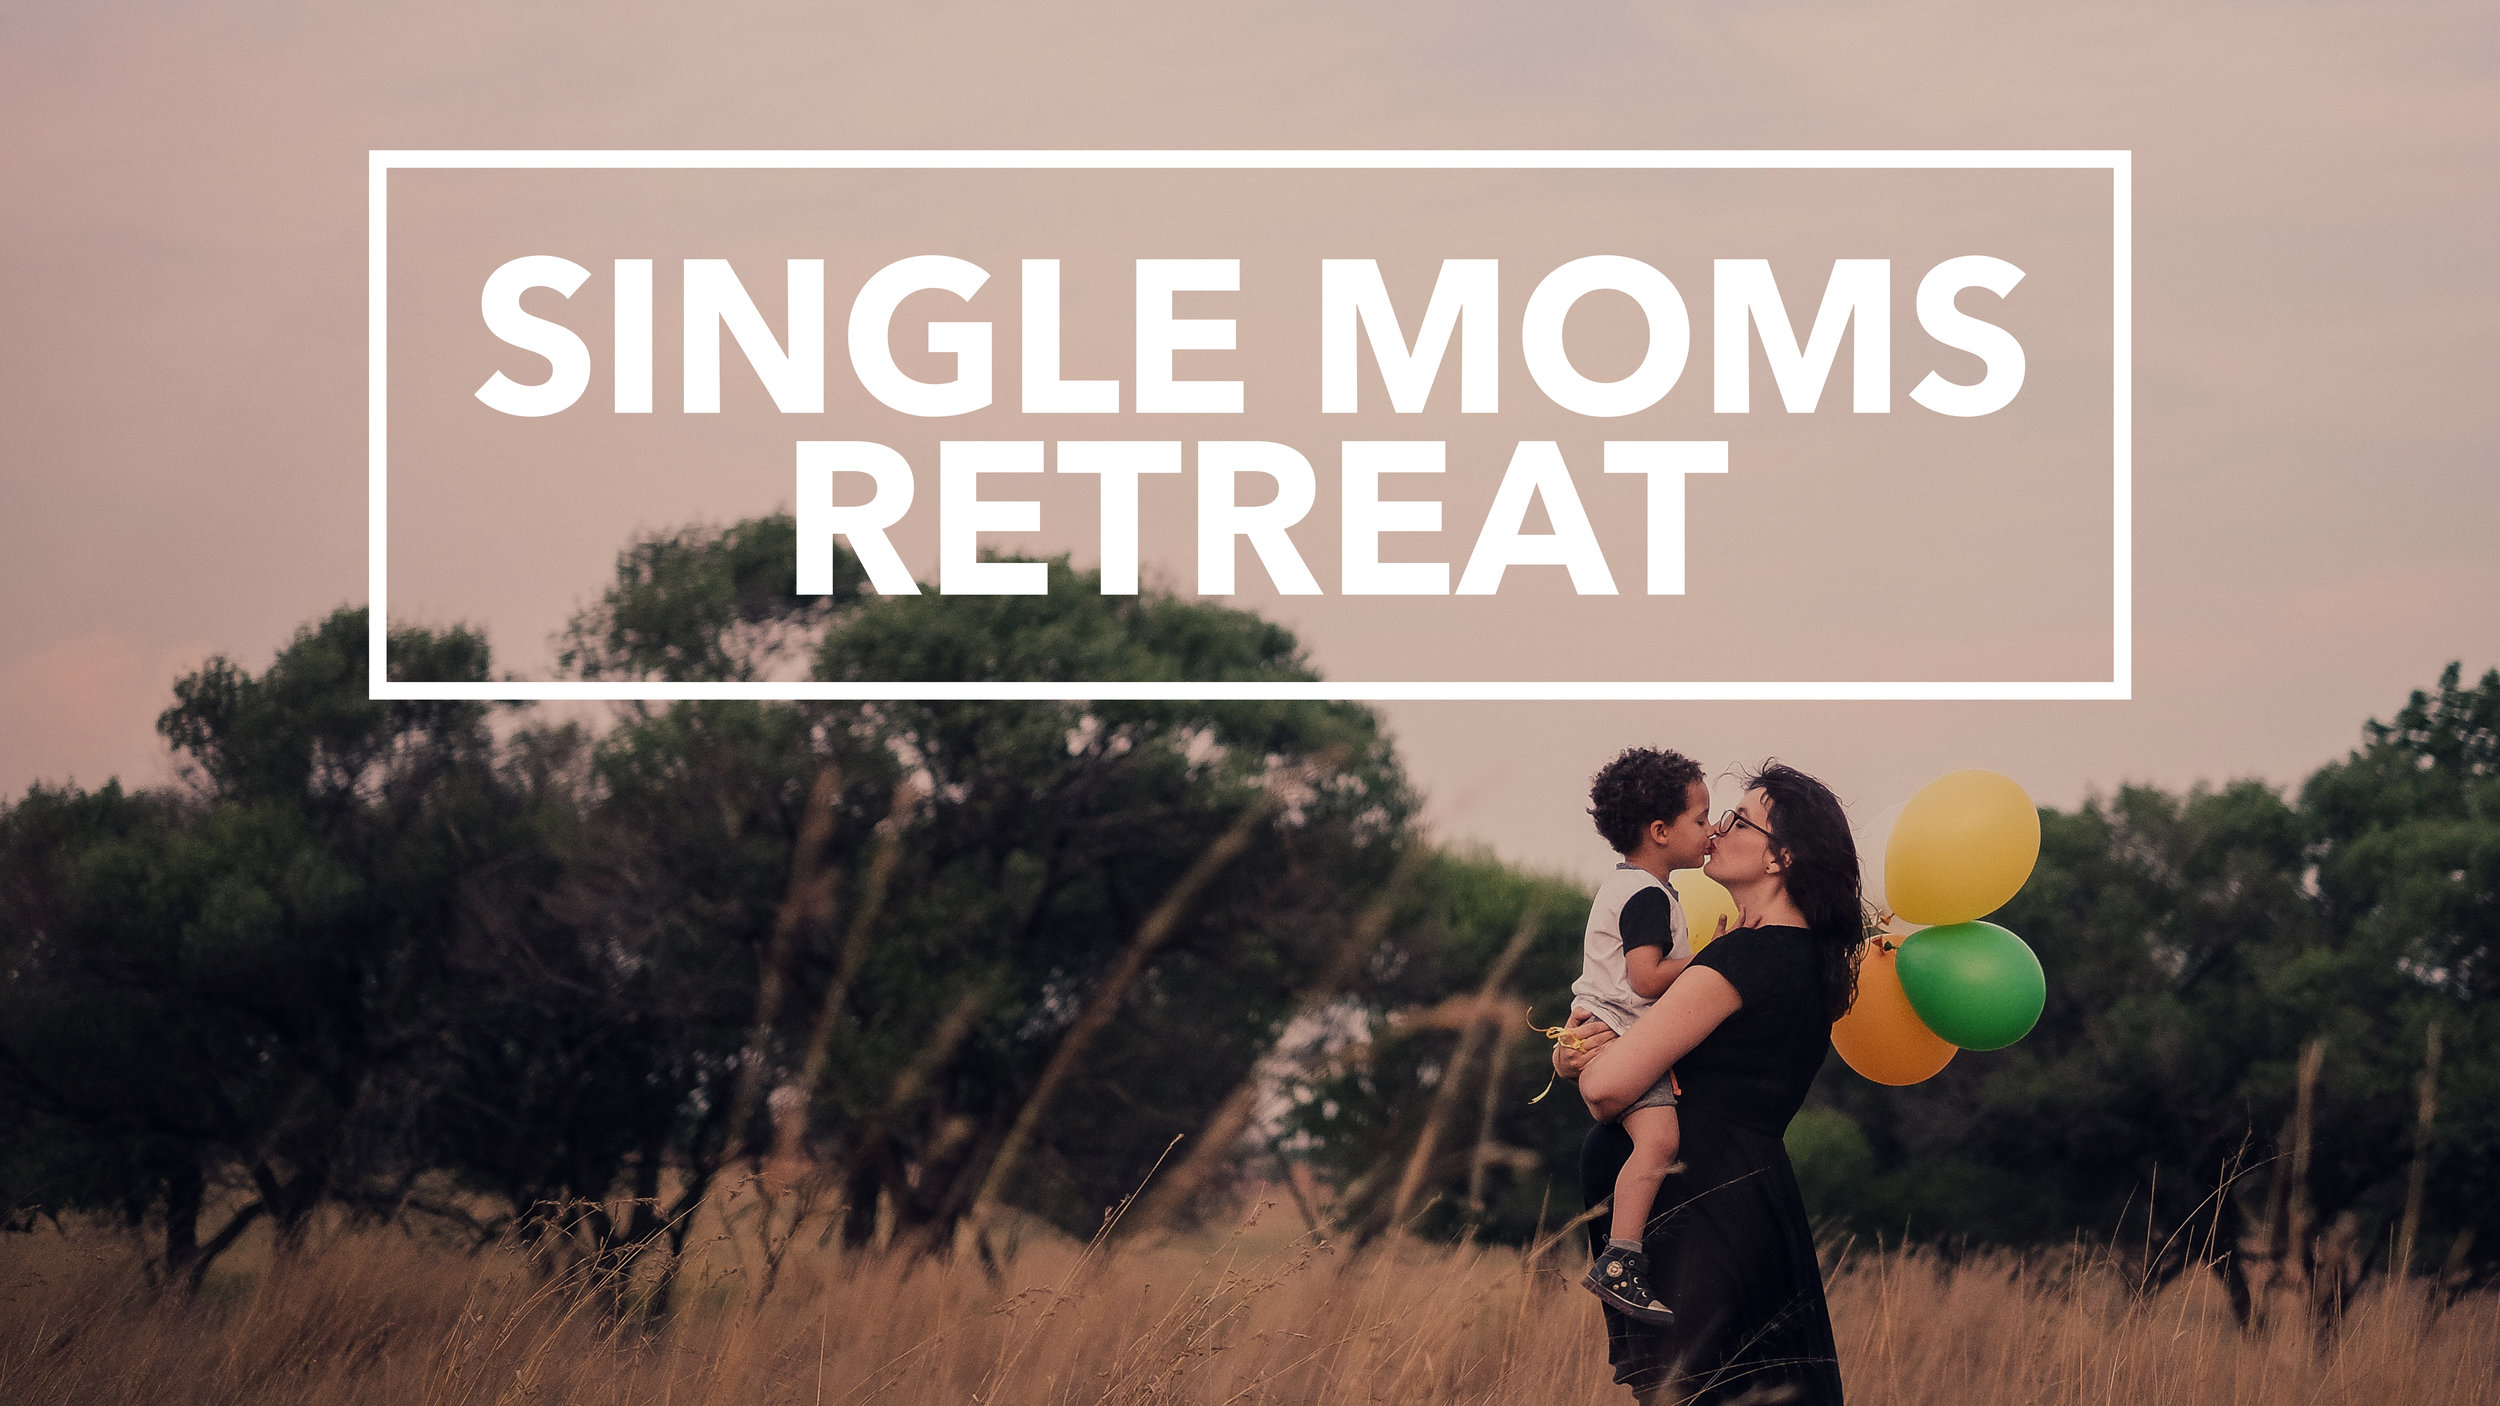 Single Moms Retreat.jpg